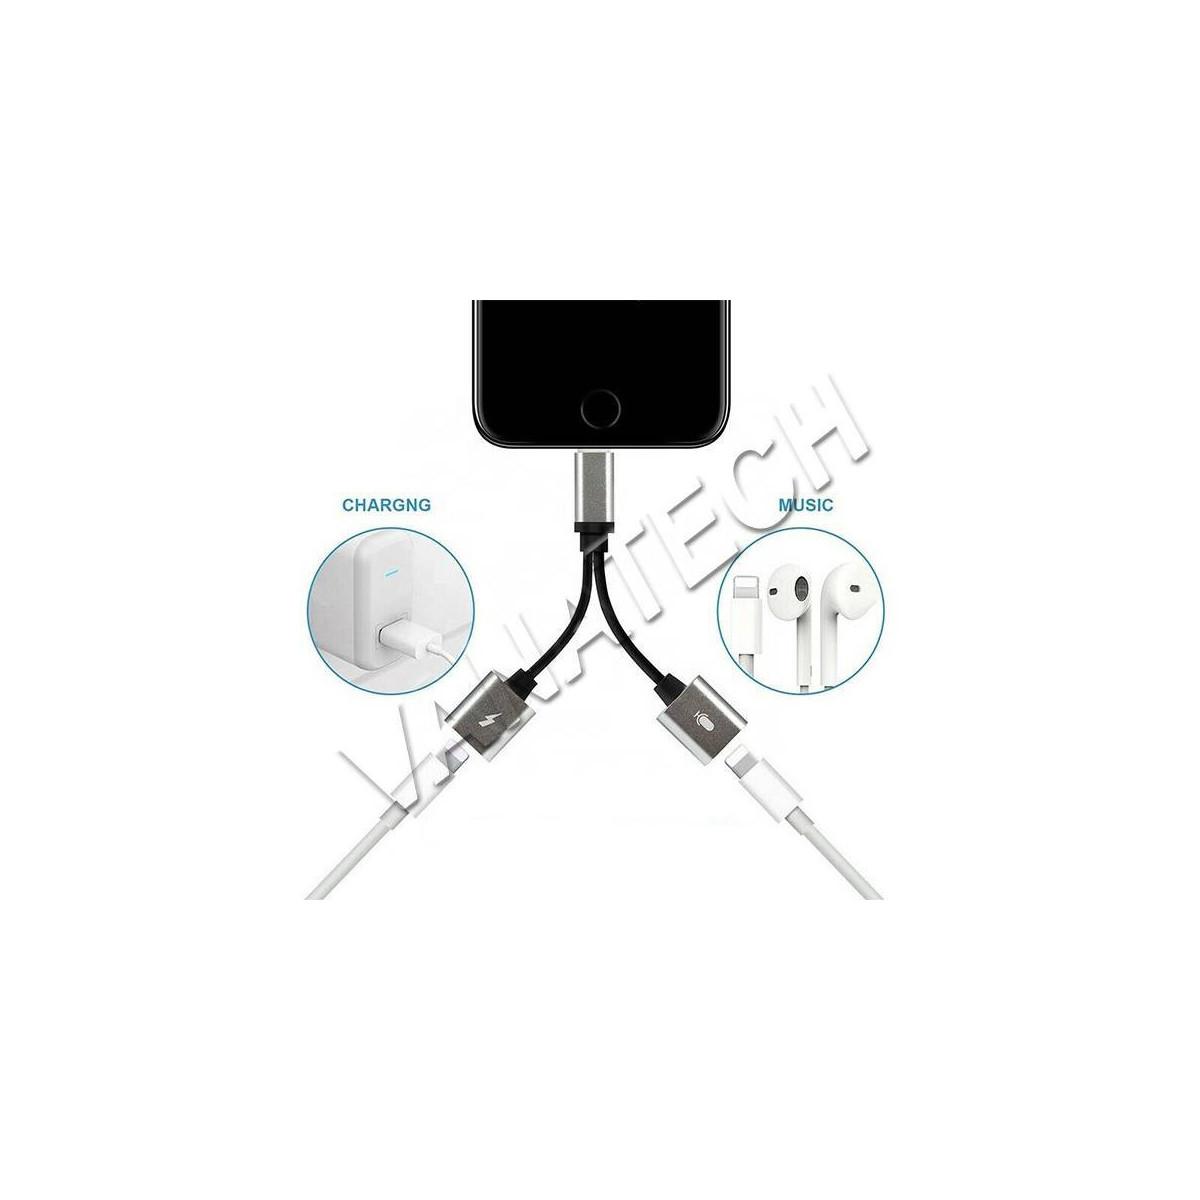 DISPLAY LCD TOUCH SCREEN VETRO HUAWEI ASSEMBLATO G PLAY MINI CHC-U01 NERO